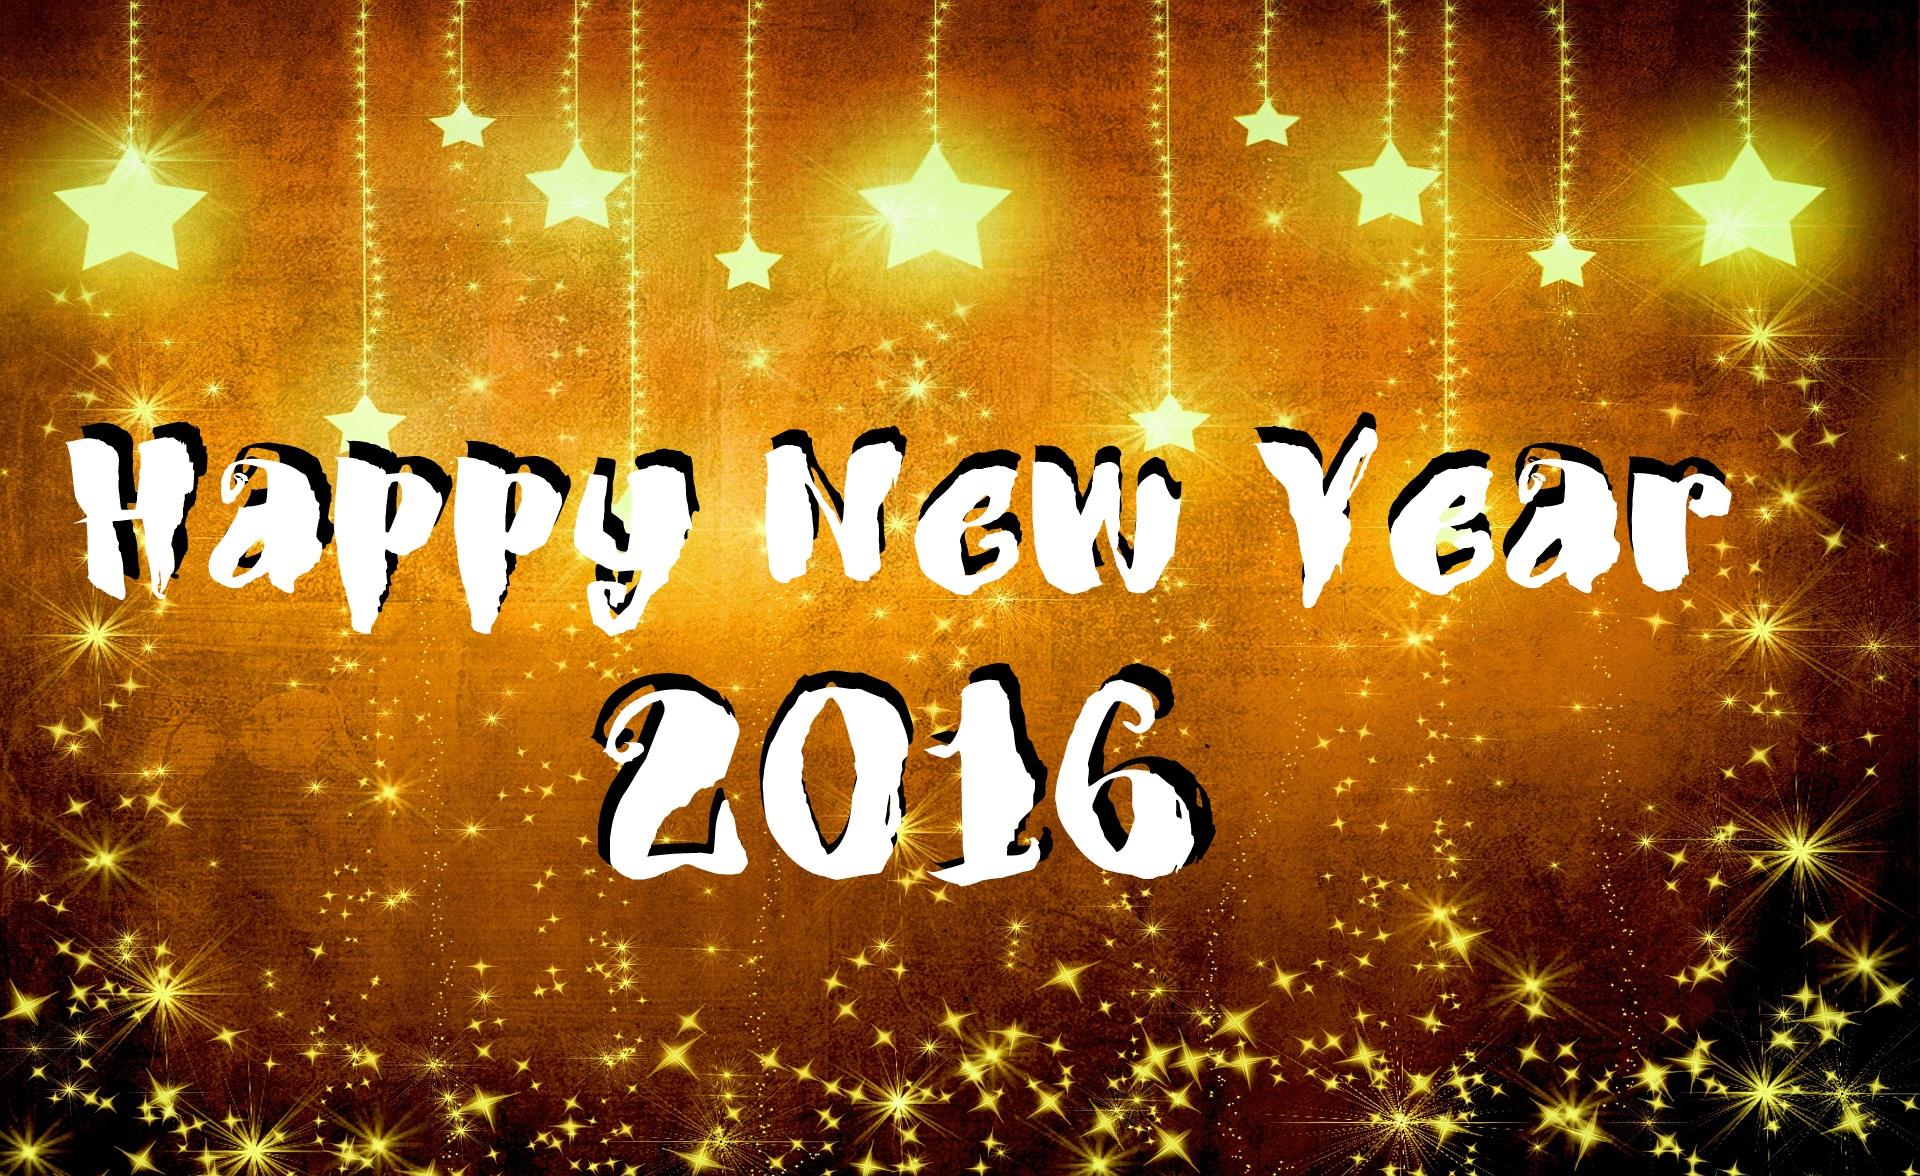 Happy new year 2016 wallpaper 1920x1176